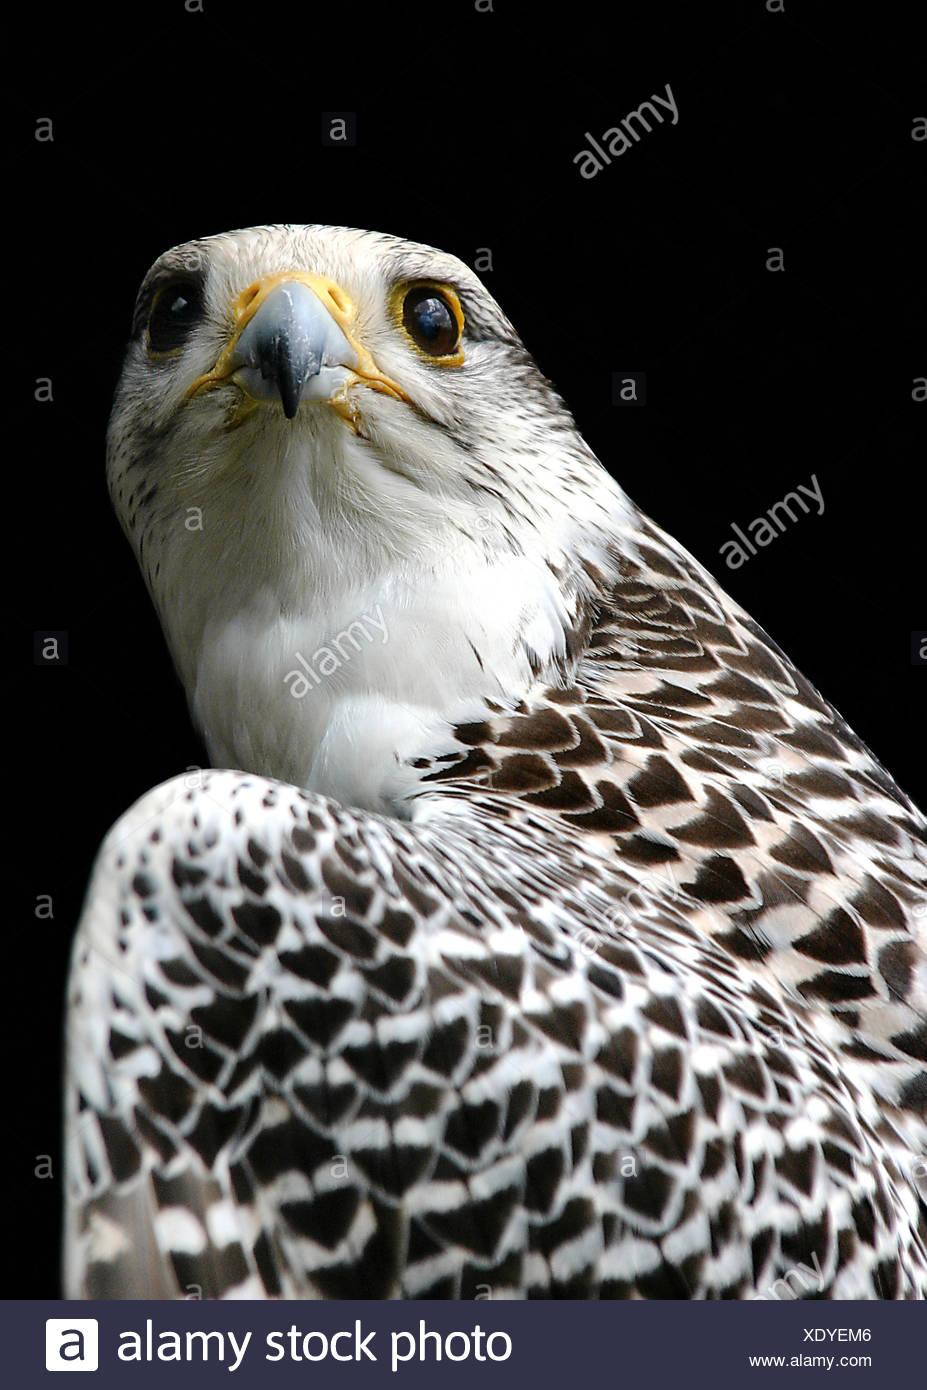 falcon,gyrfalcon,falconry - Stock Image